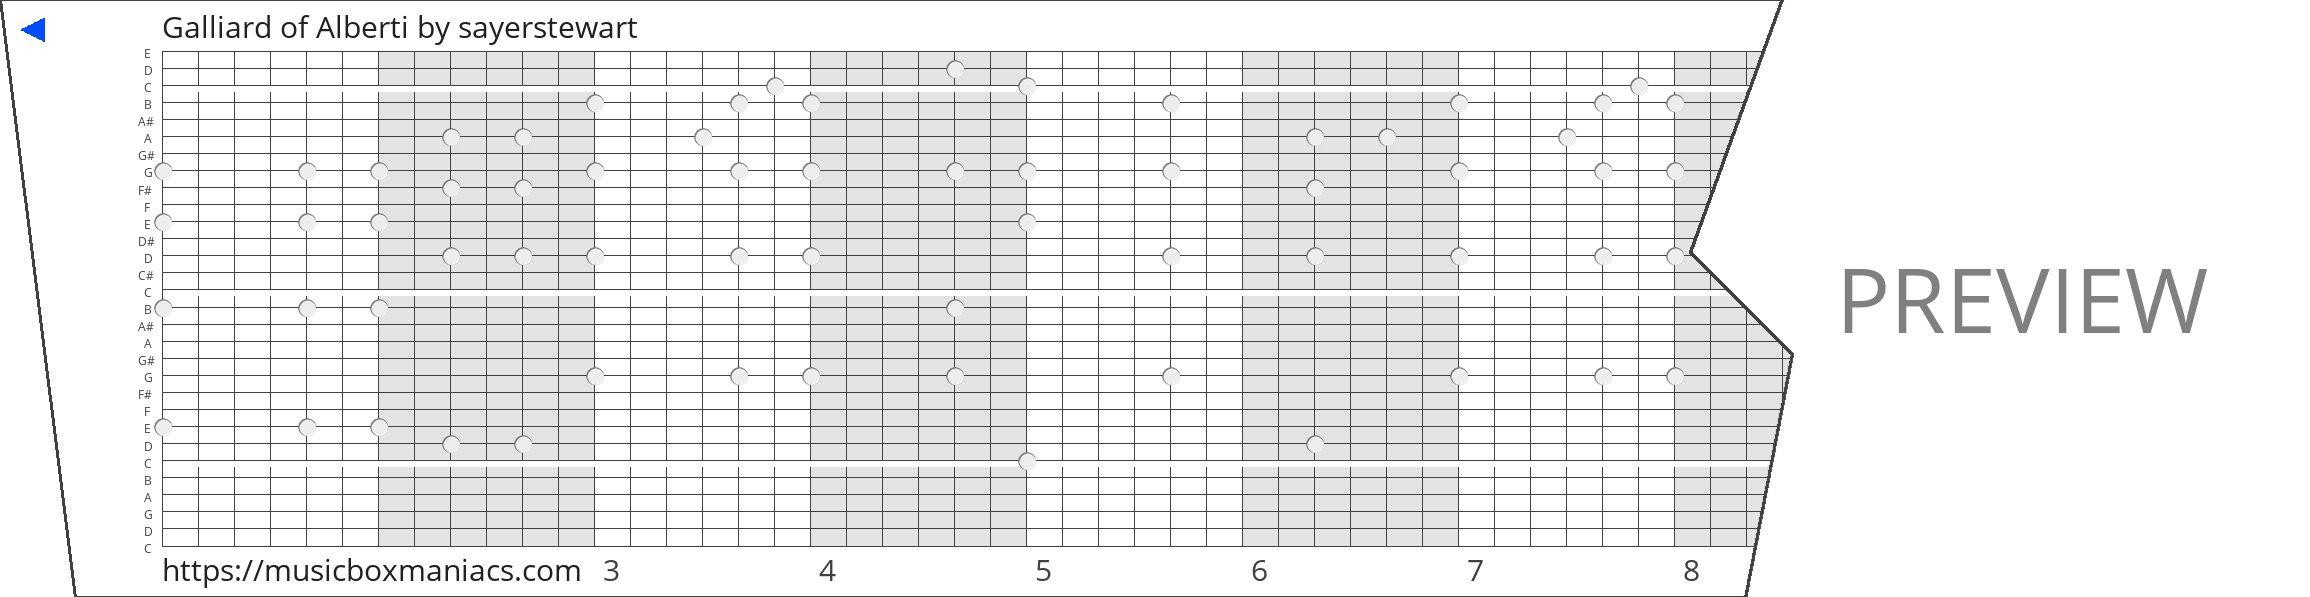 Galliard of Alberti 30 note music box paper strip